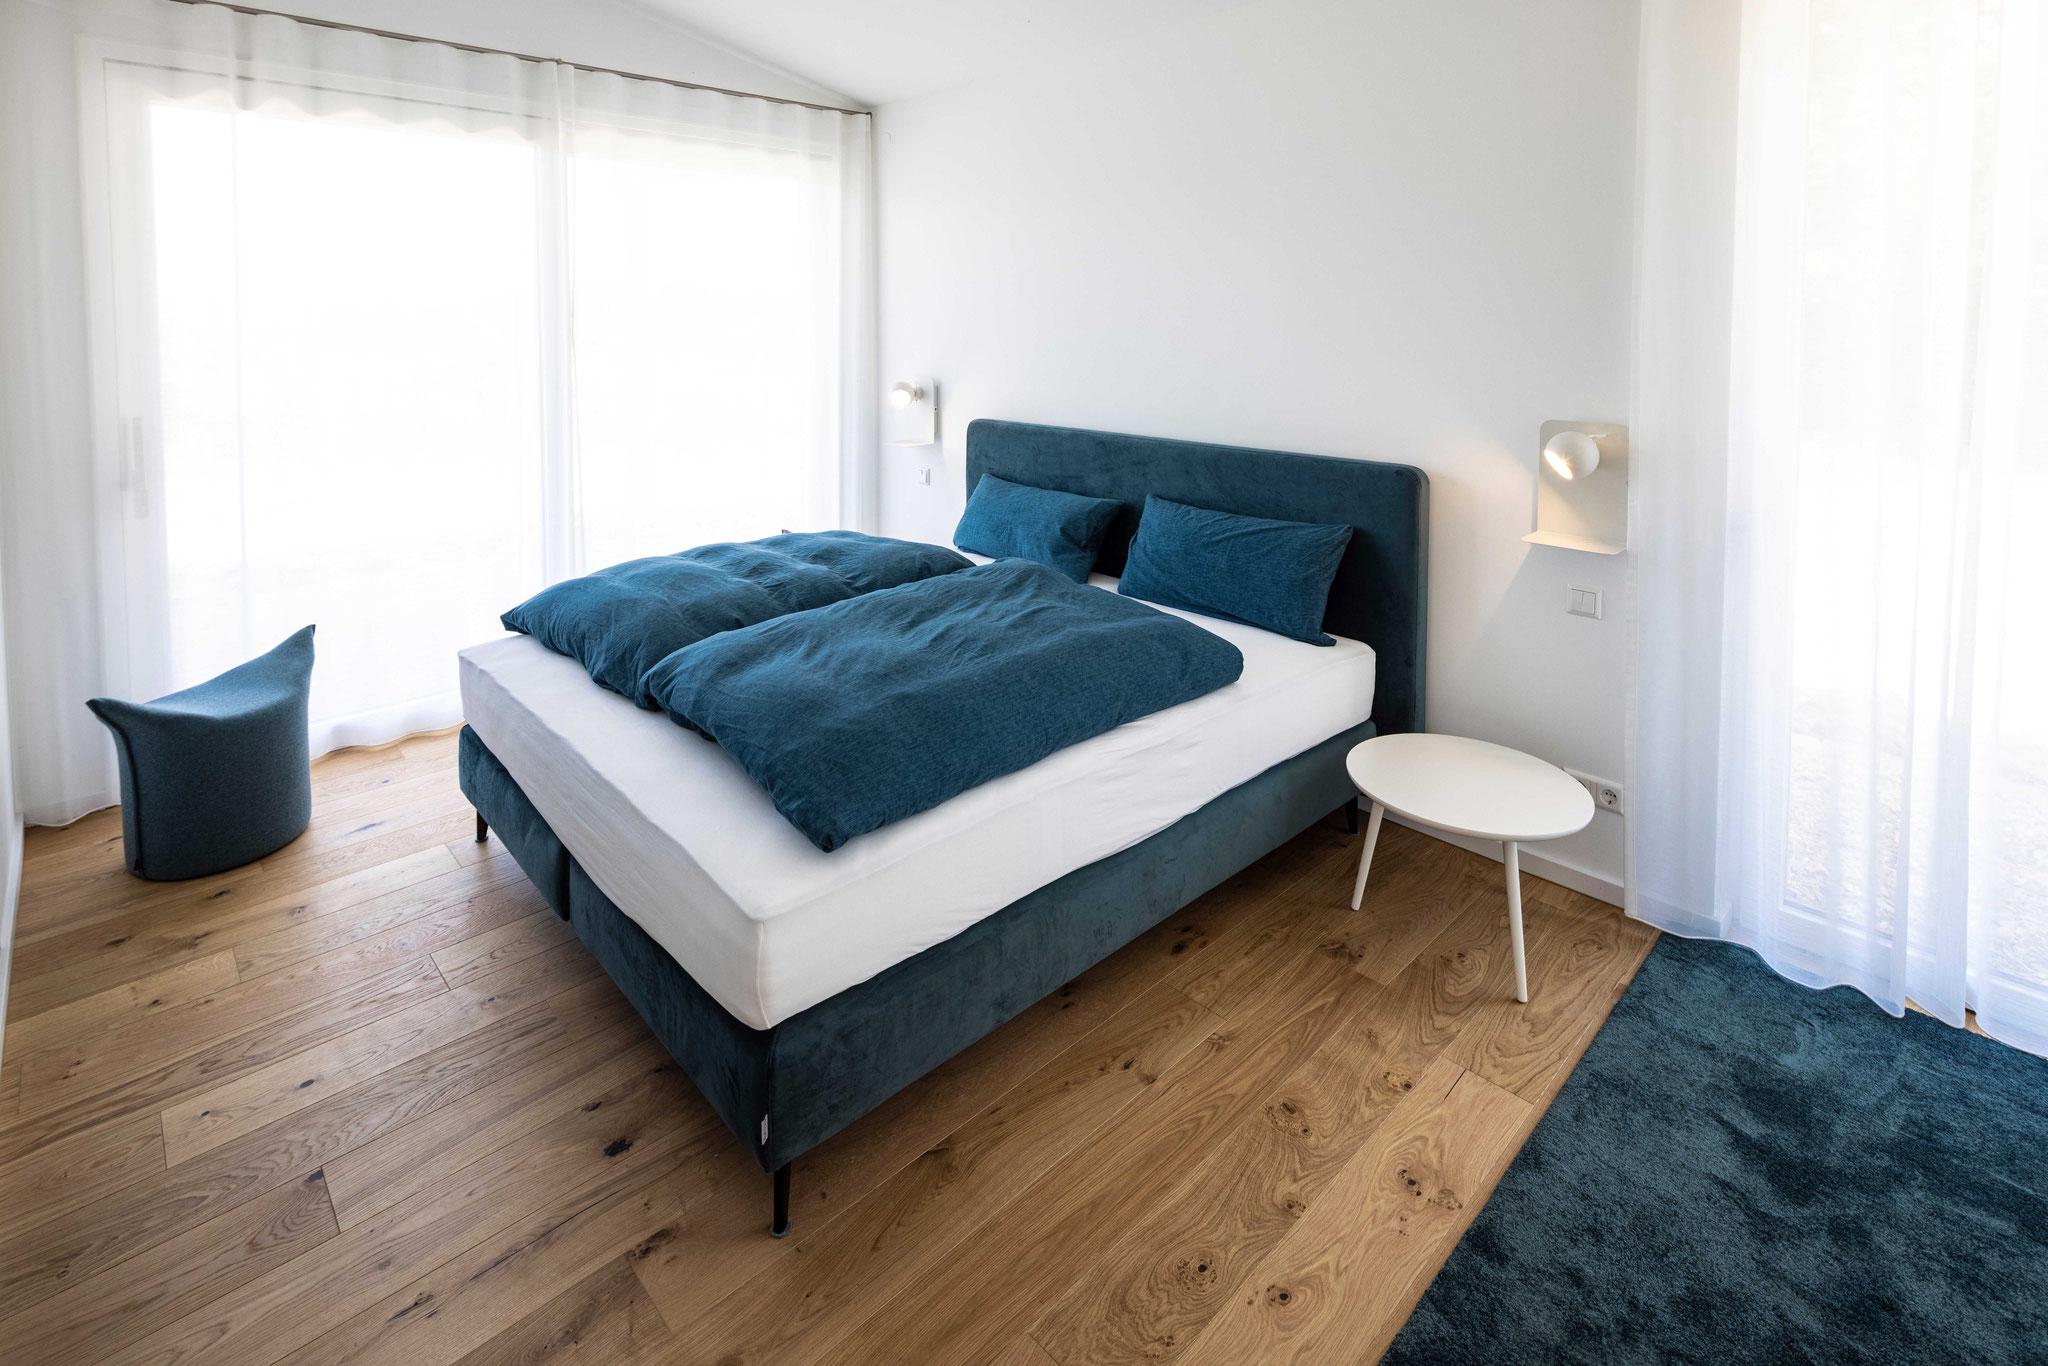 Boxspring-Bett im Schlafzimmer